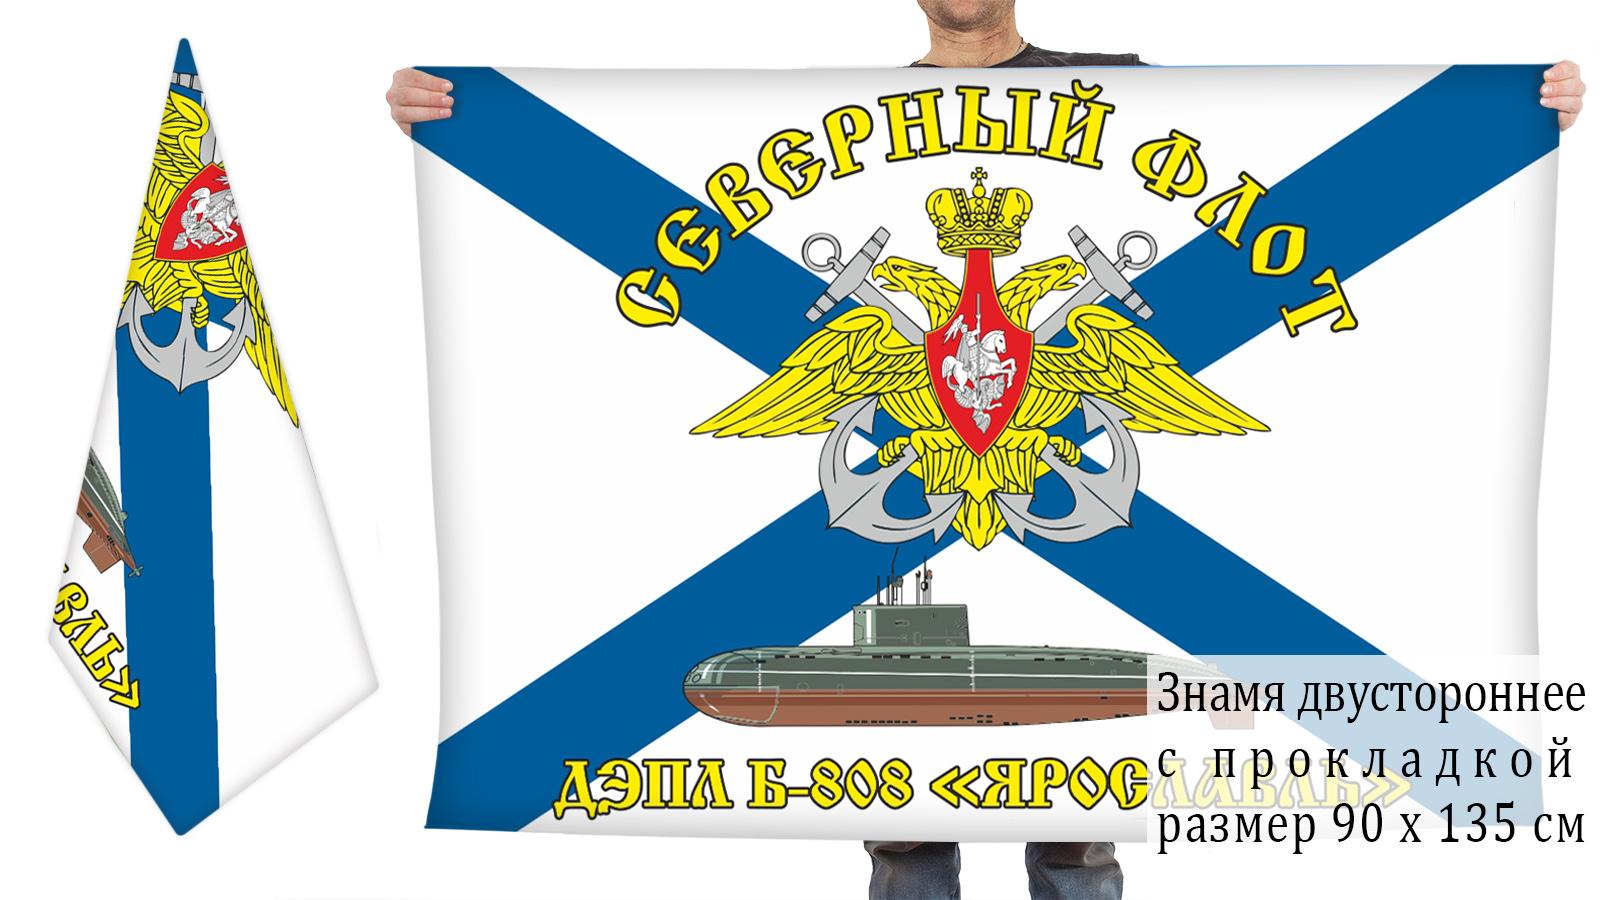 Двухсторонний флаг ДЭПЛ Б-808 Ярославль Северный флот